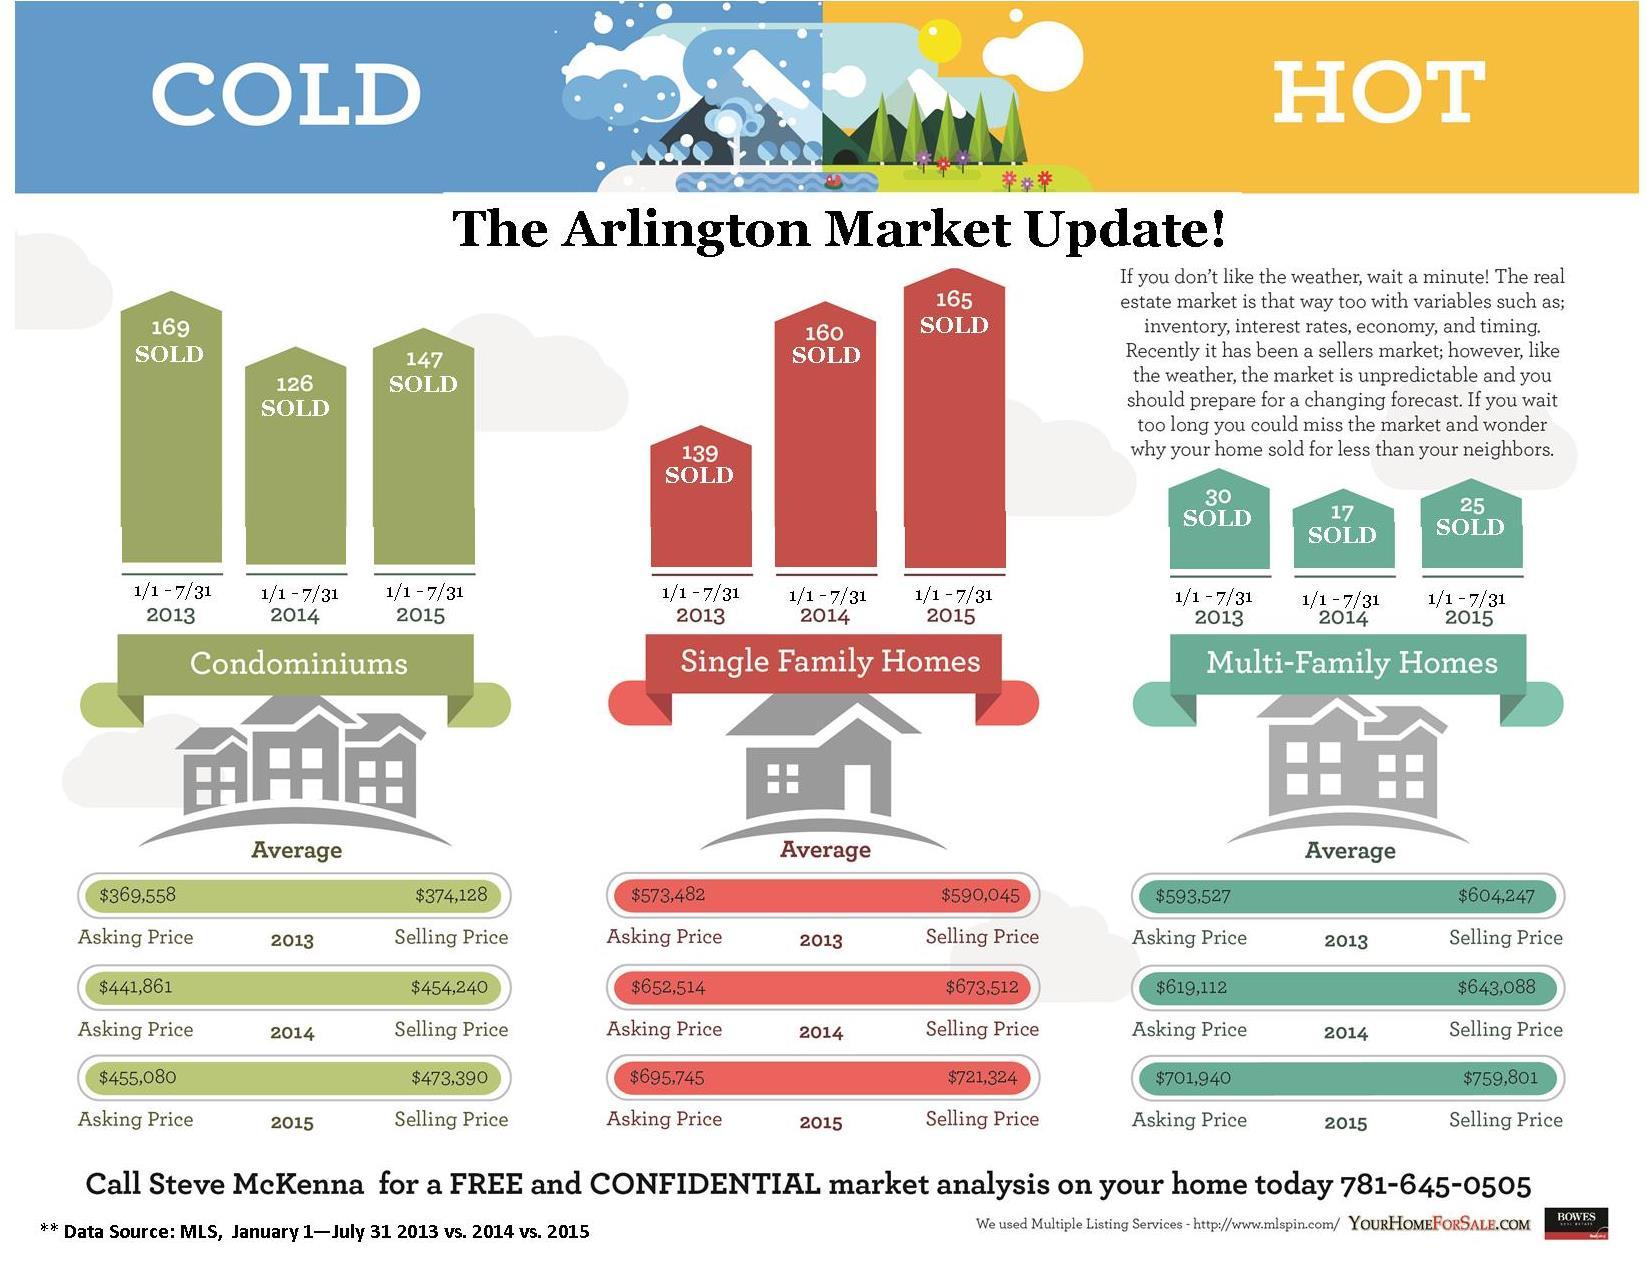 Arlington MA Real Estate Market Update